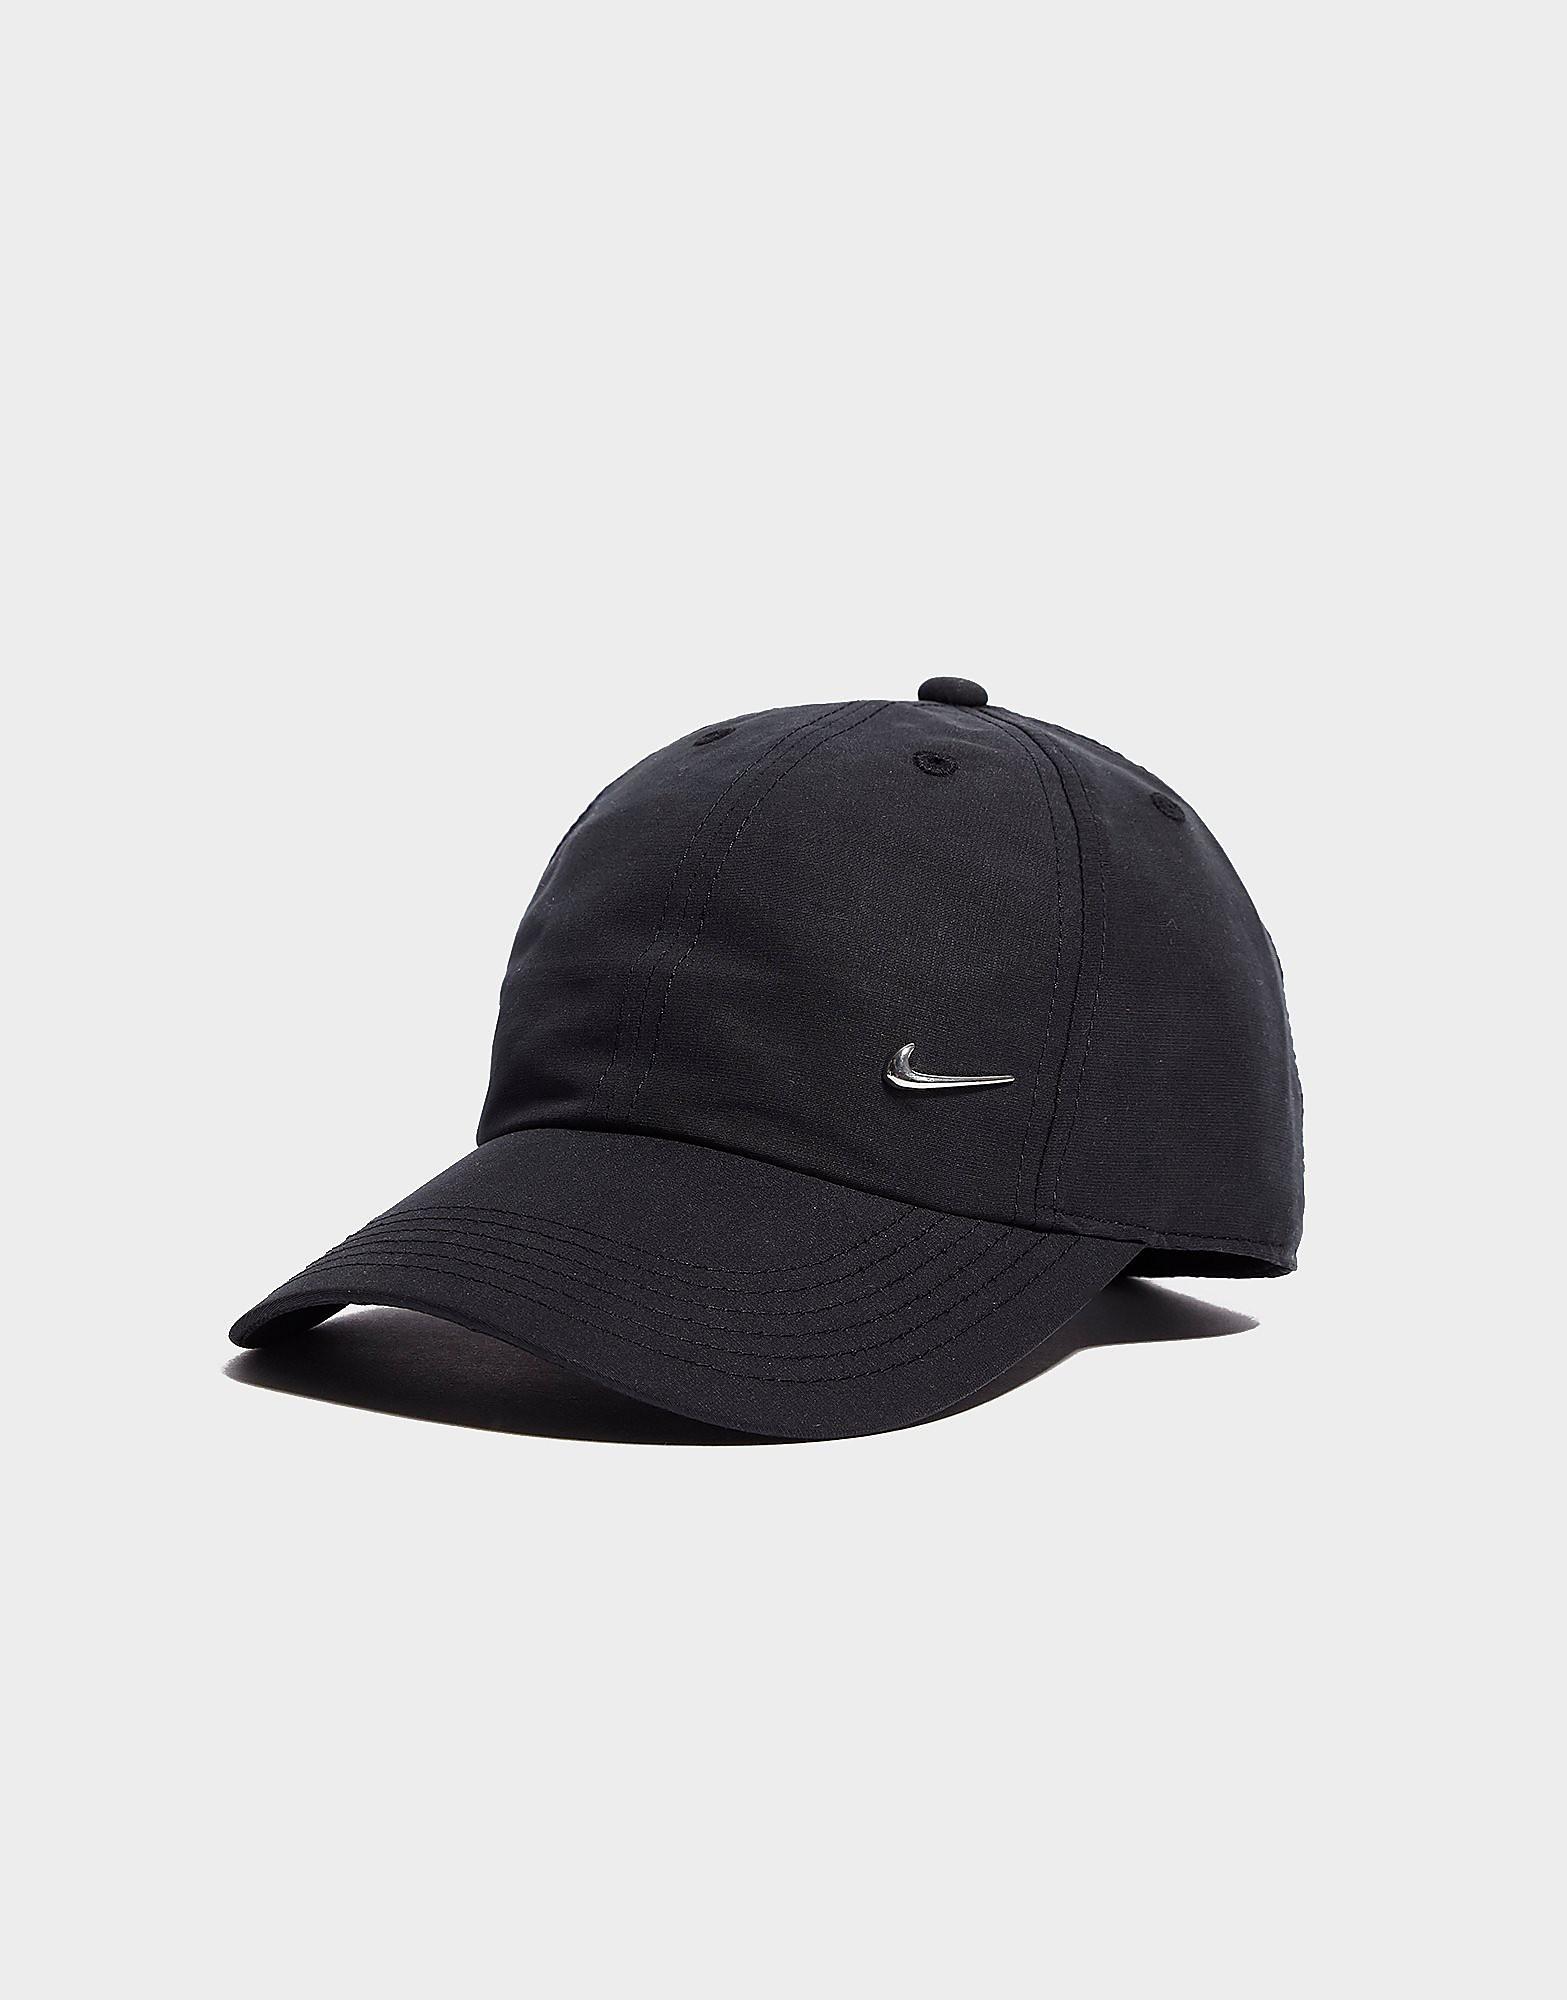 Nike Side Swoosh Cap Junior - Black/Silver - Kids, Black/Silver